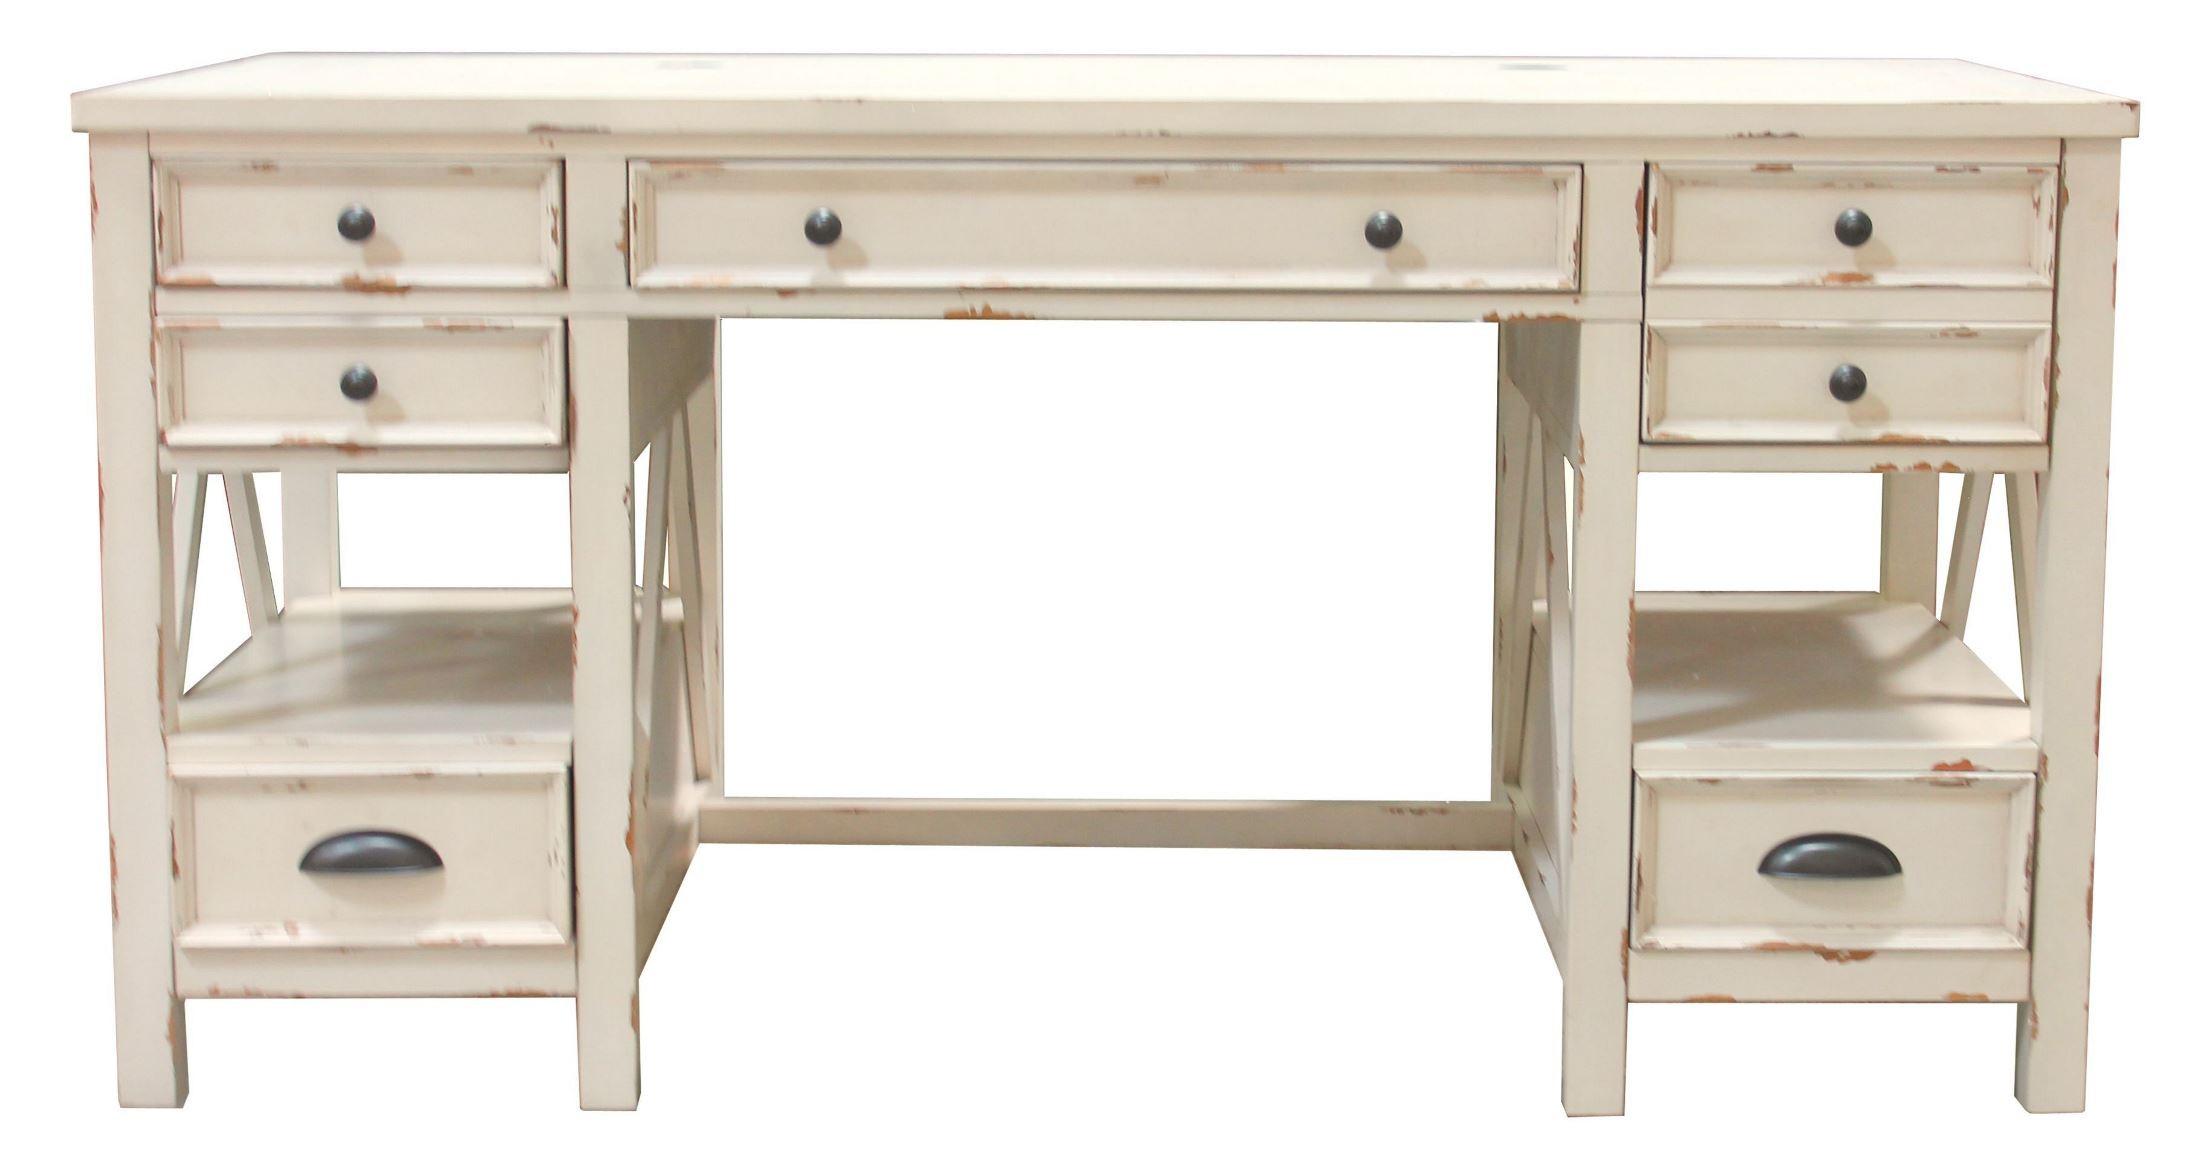 Design White Writing Desk nantucket vintage burnished artisanal white writing desk from desk